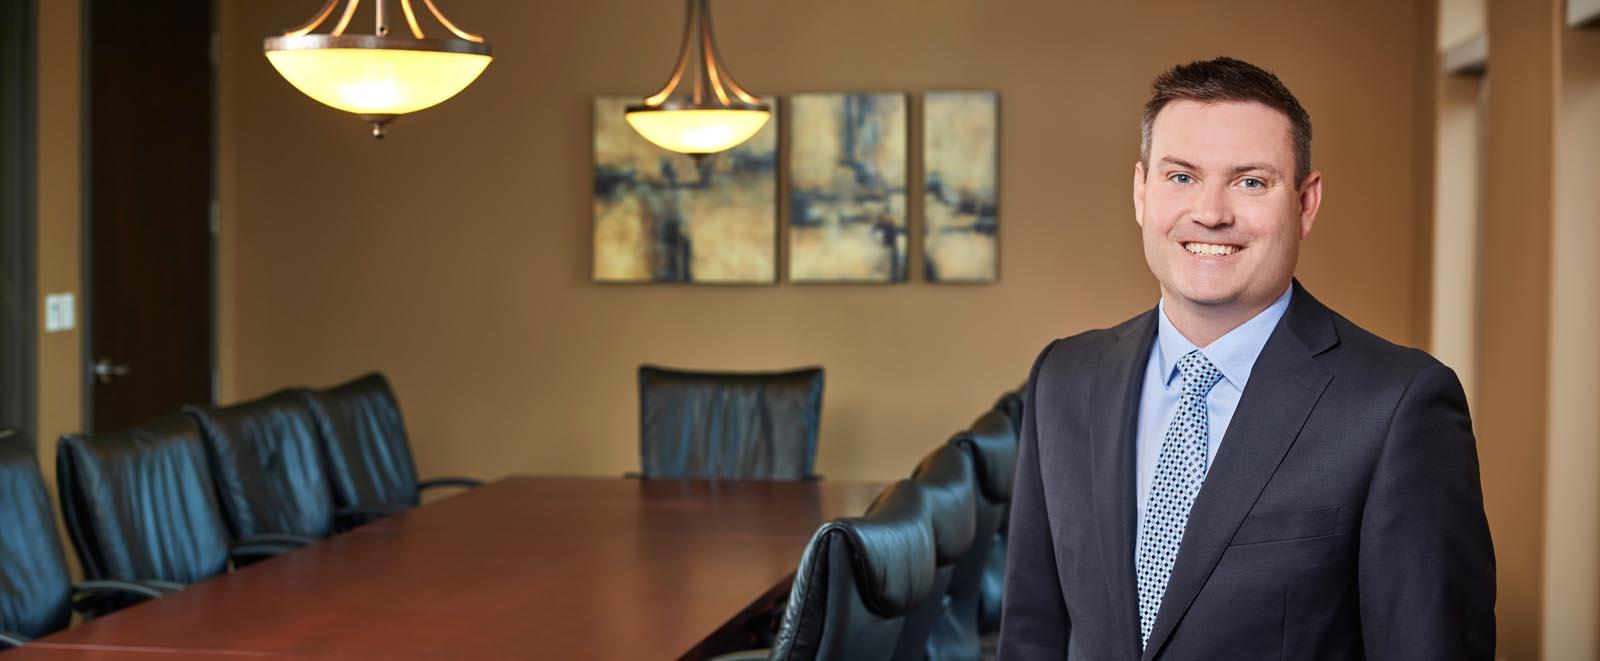 Steve_Mcgaghran_Millards Chartered Professional Accountants